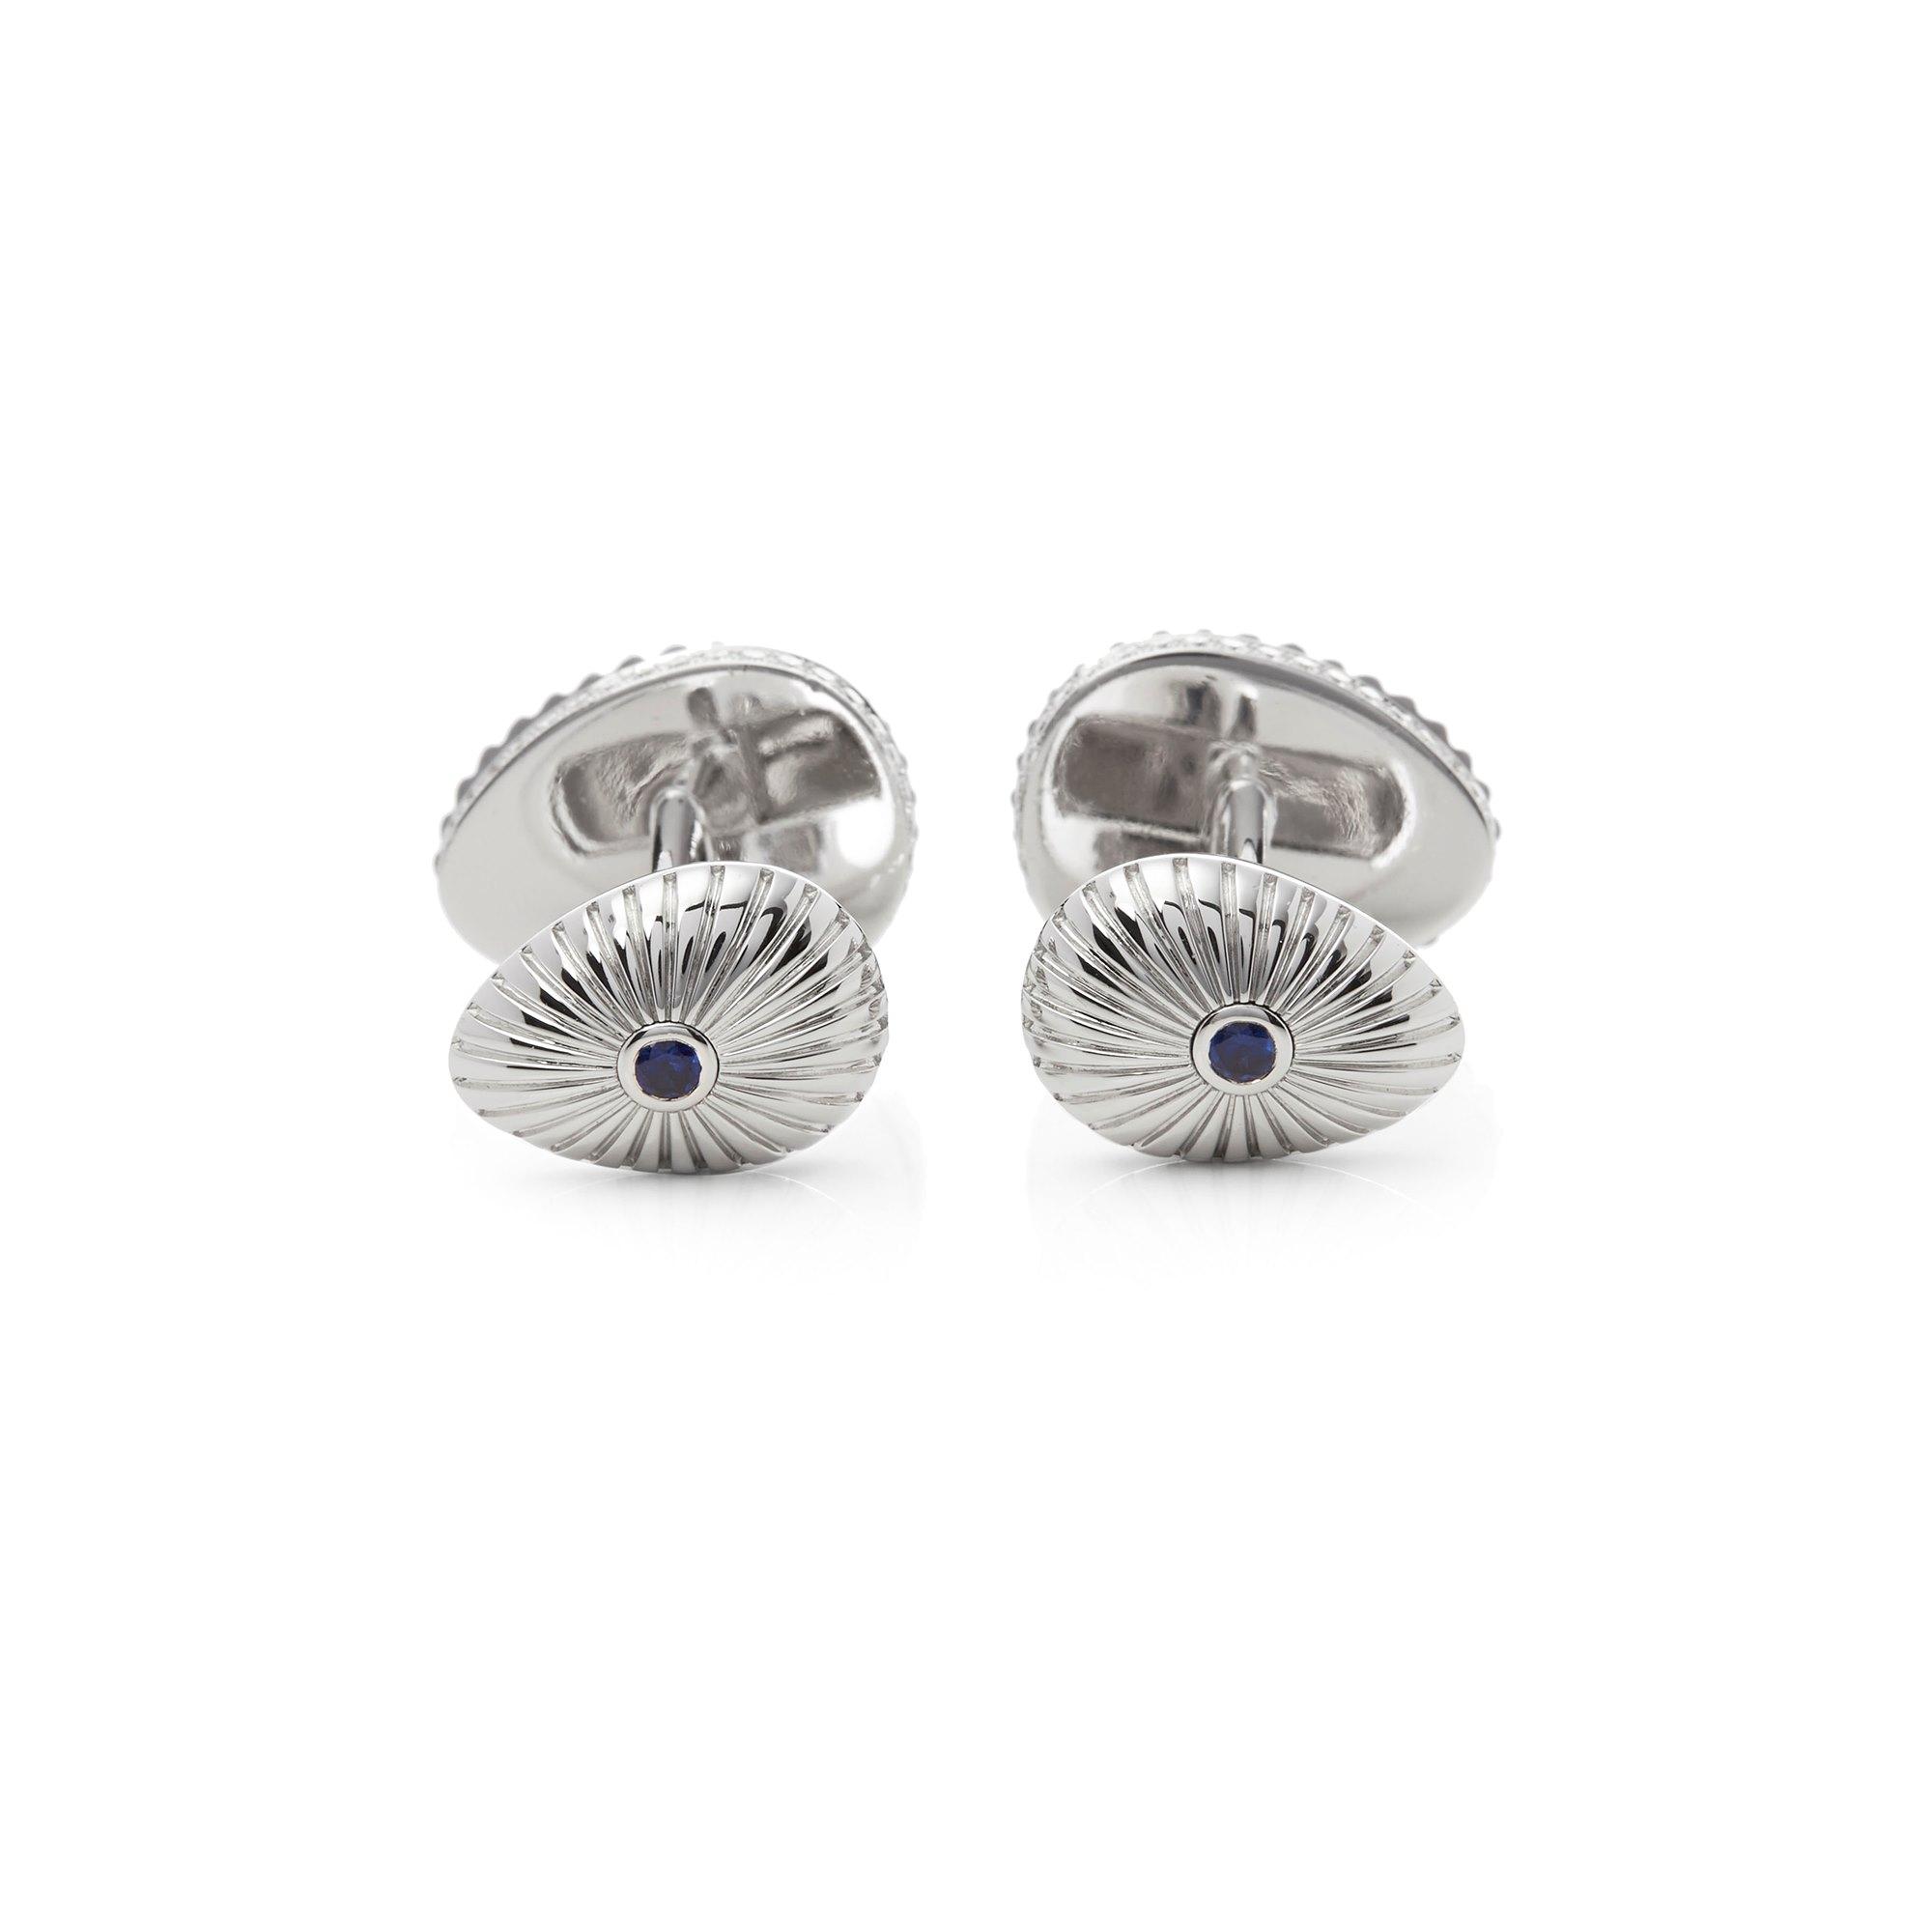 Fabergé 18k White Gold Sapphire & Diamond Grigori Cufflinks